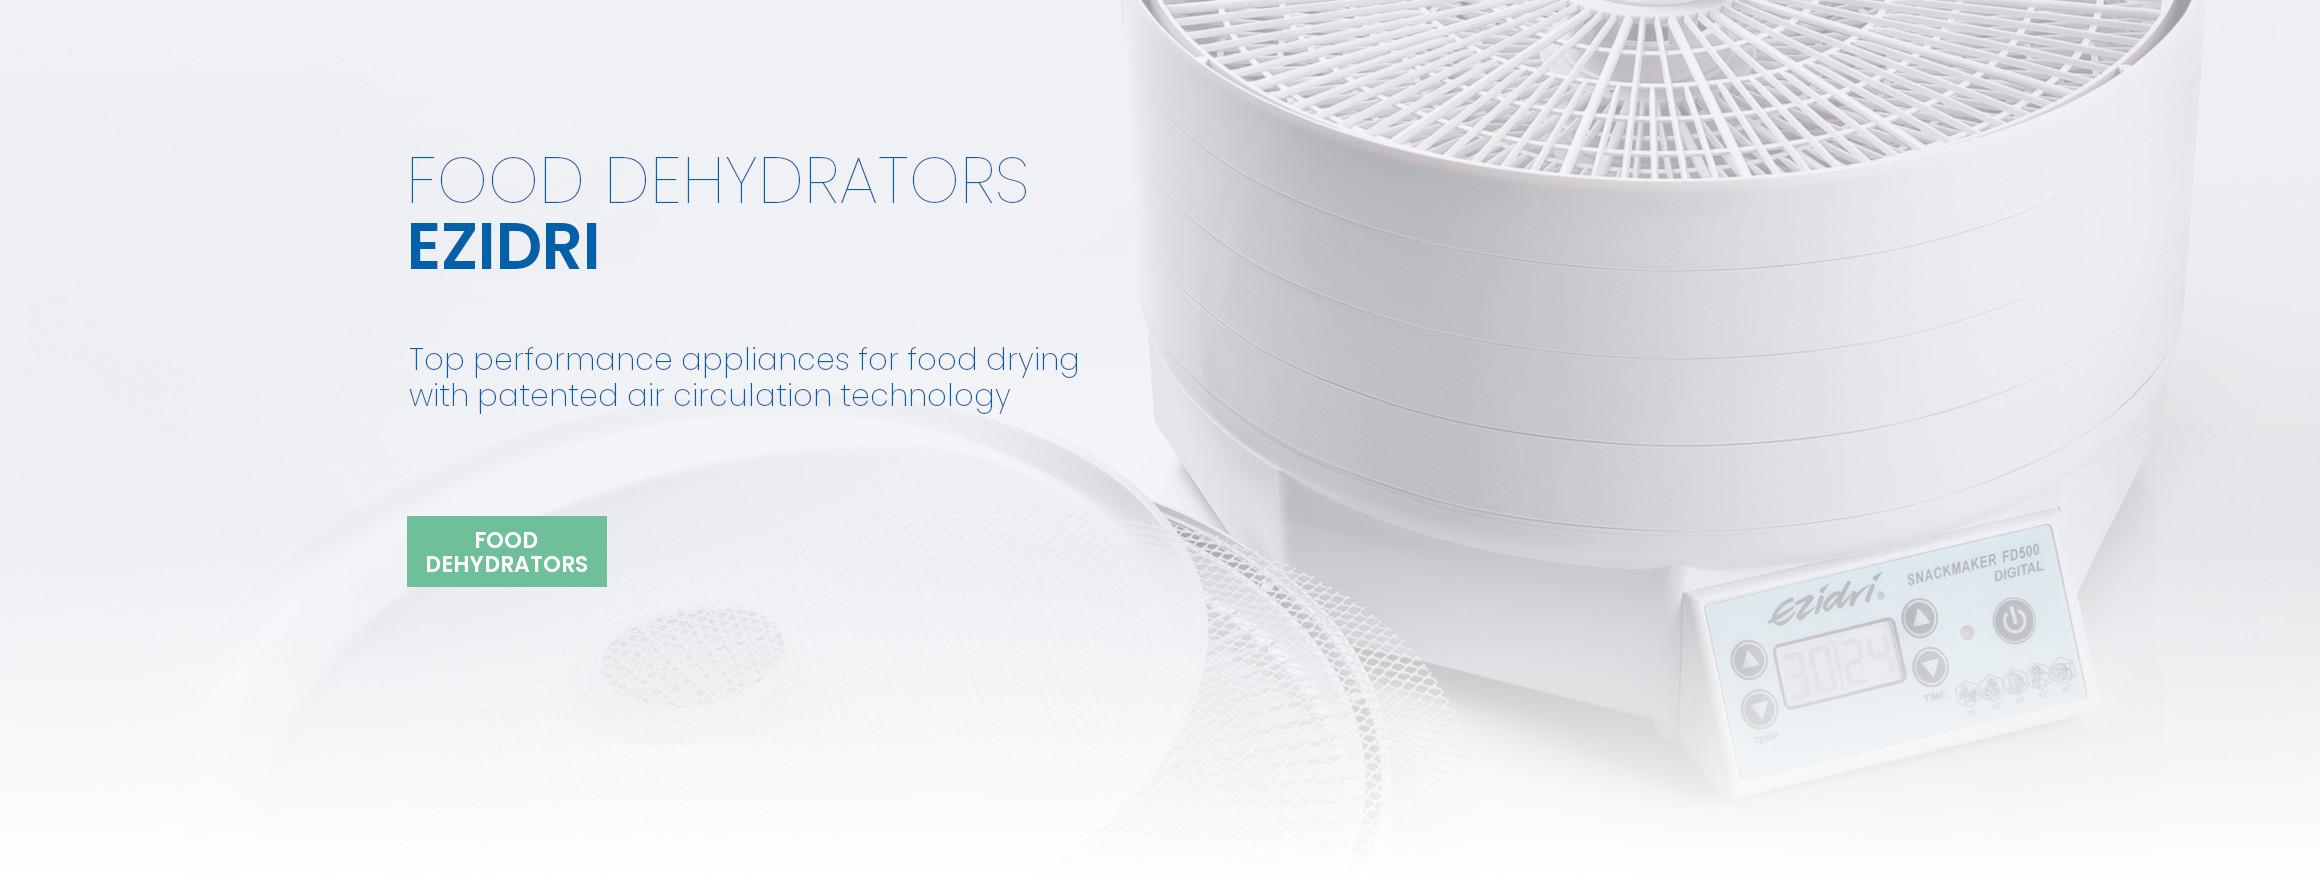 EZIDRI food dehydrators